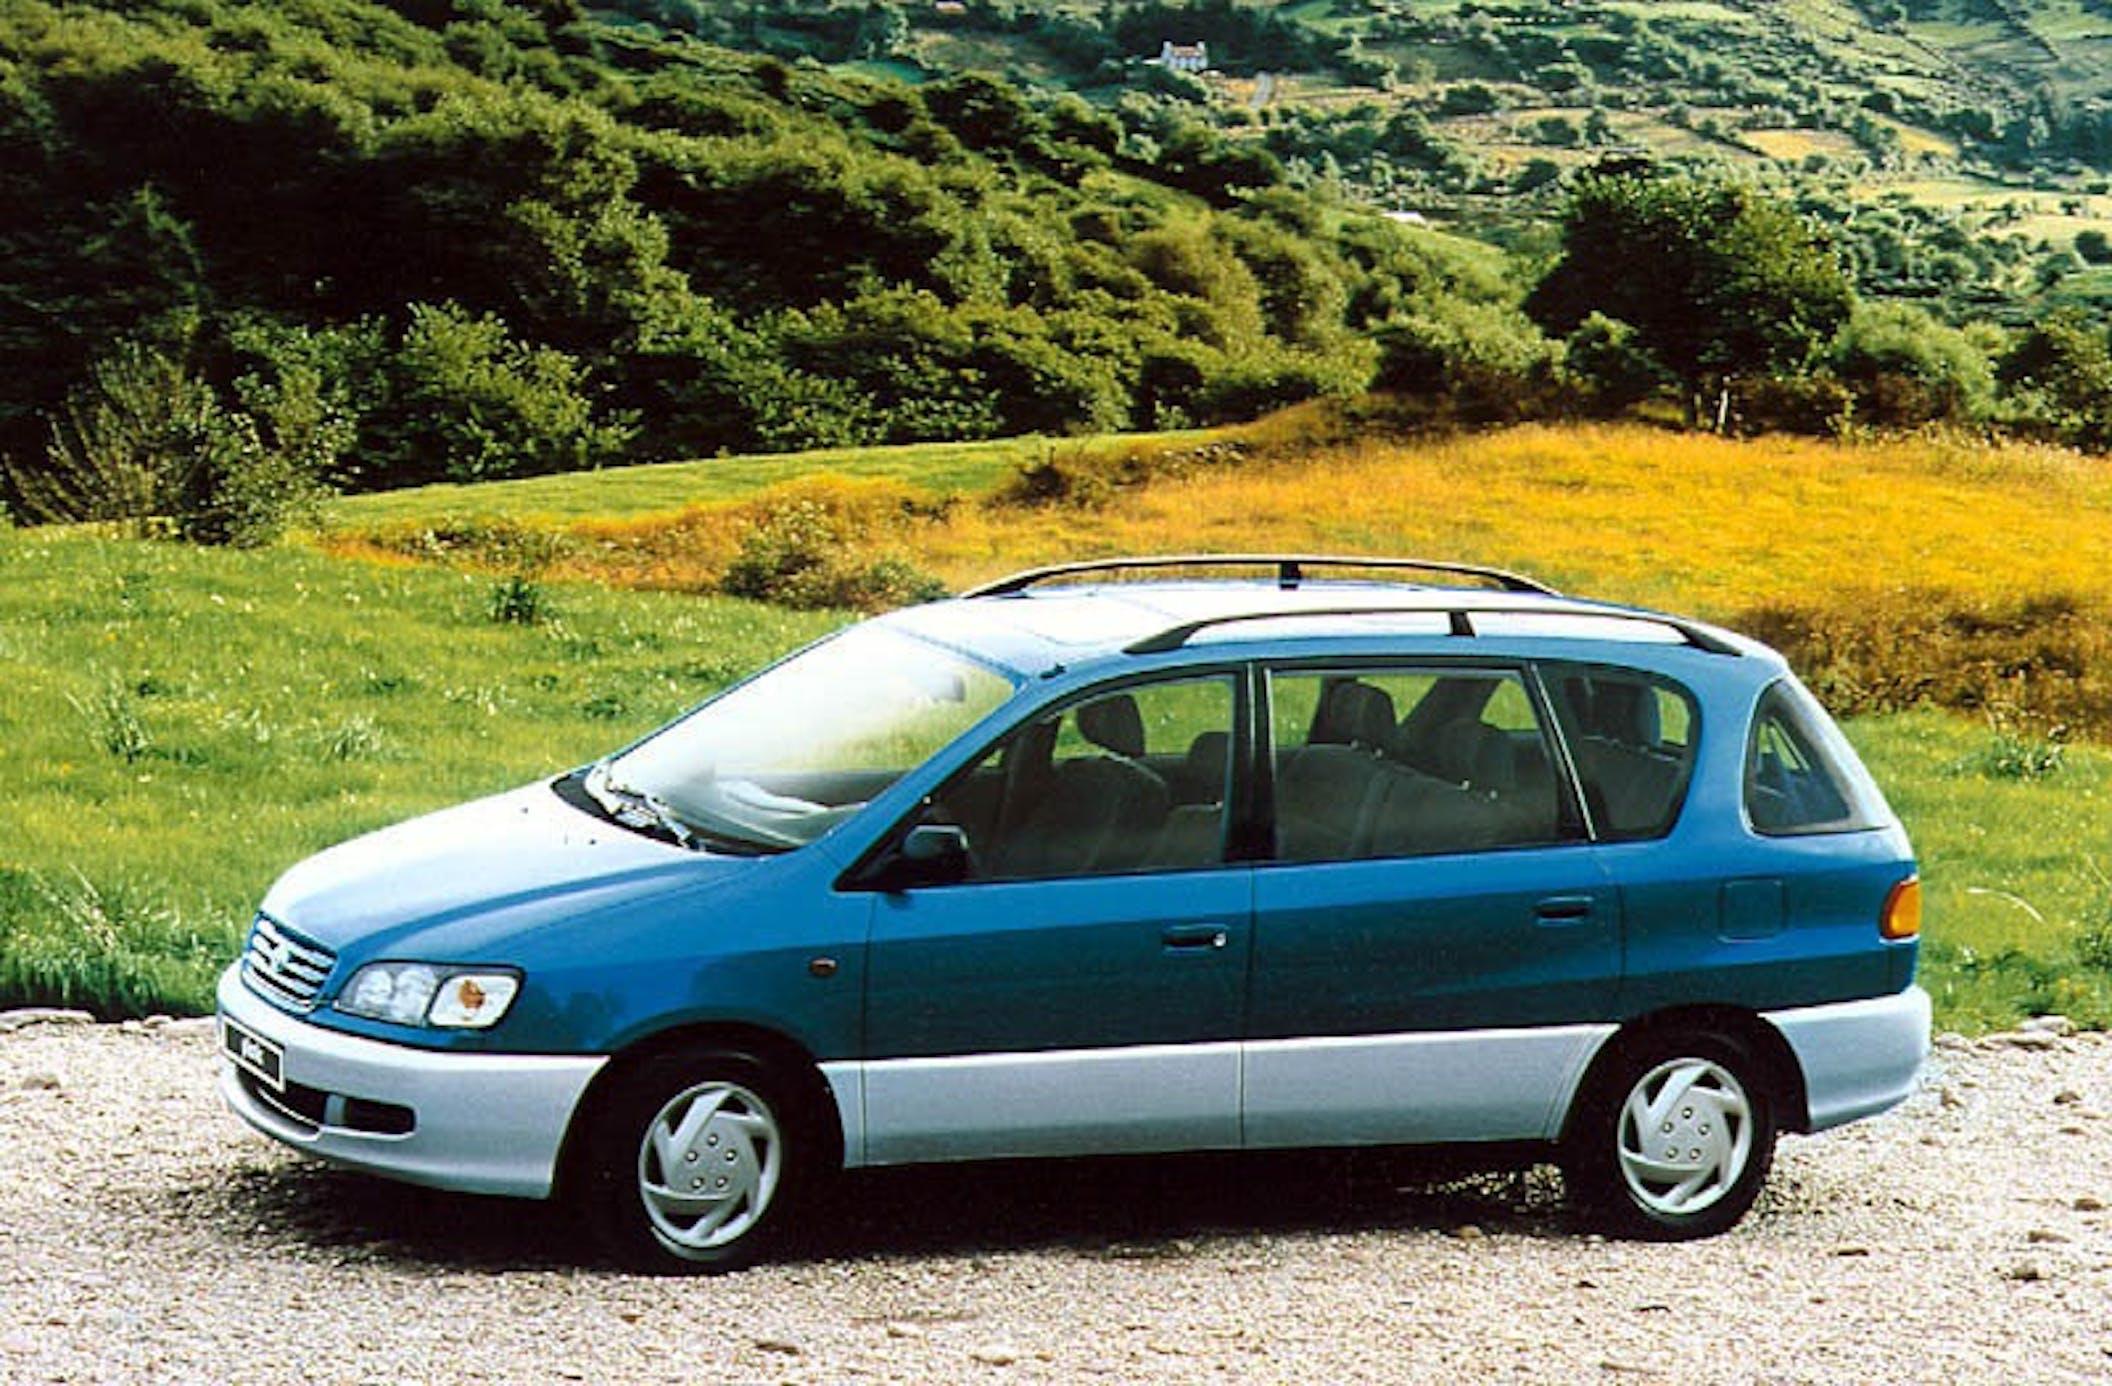 NOT - Toyota Picnic